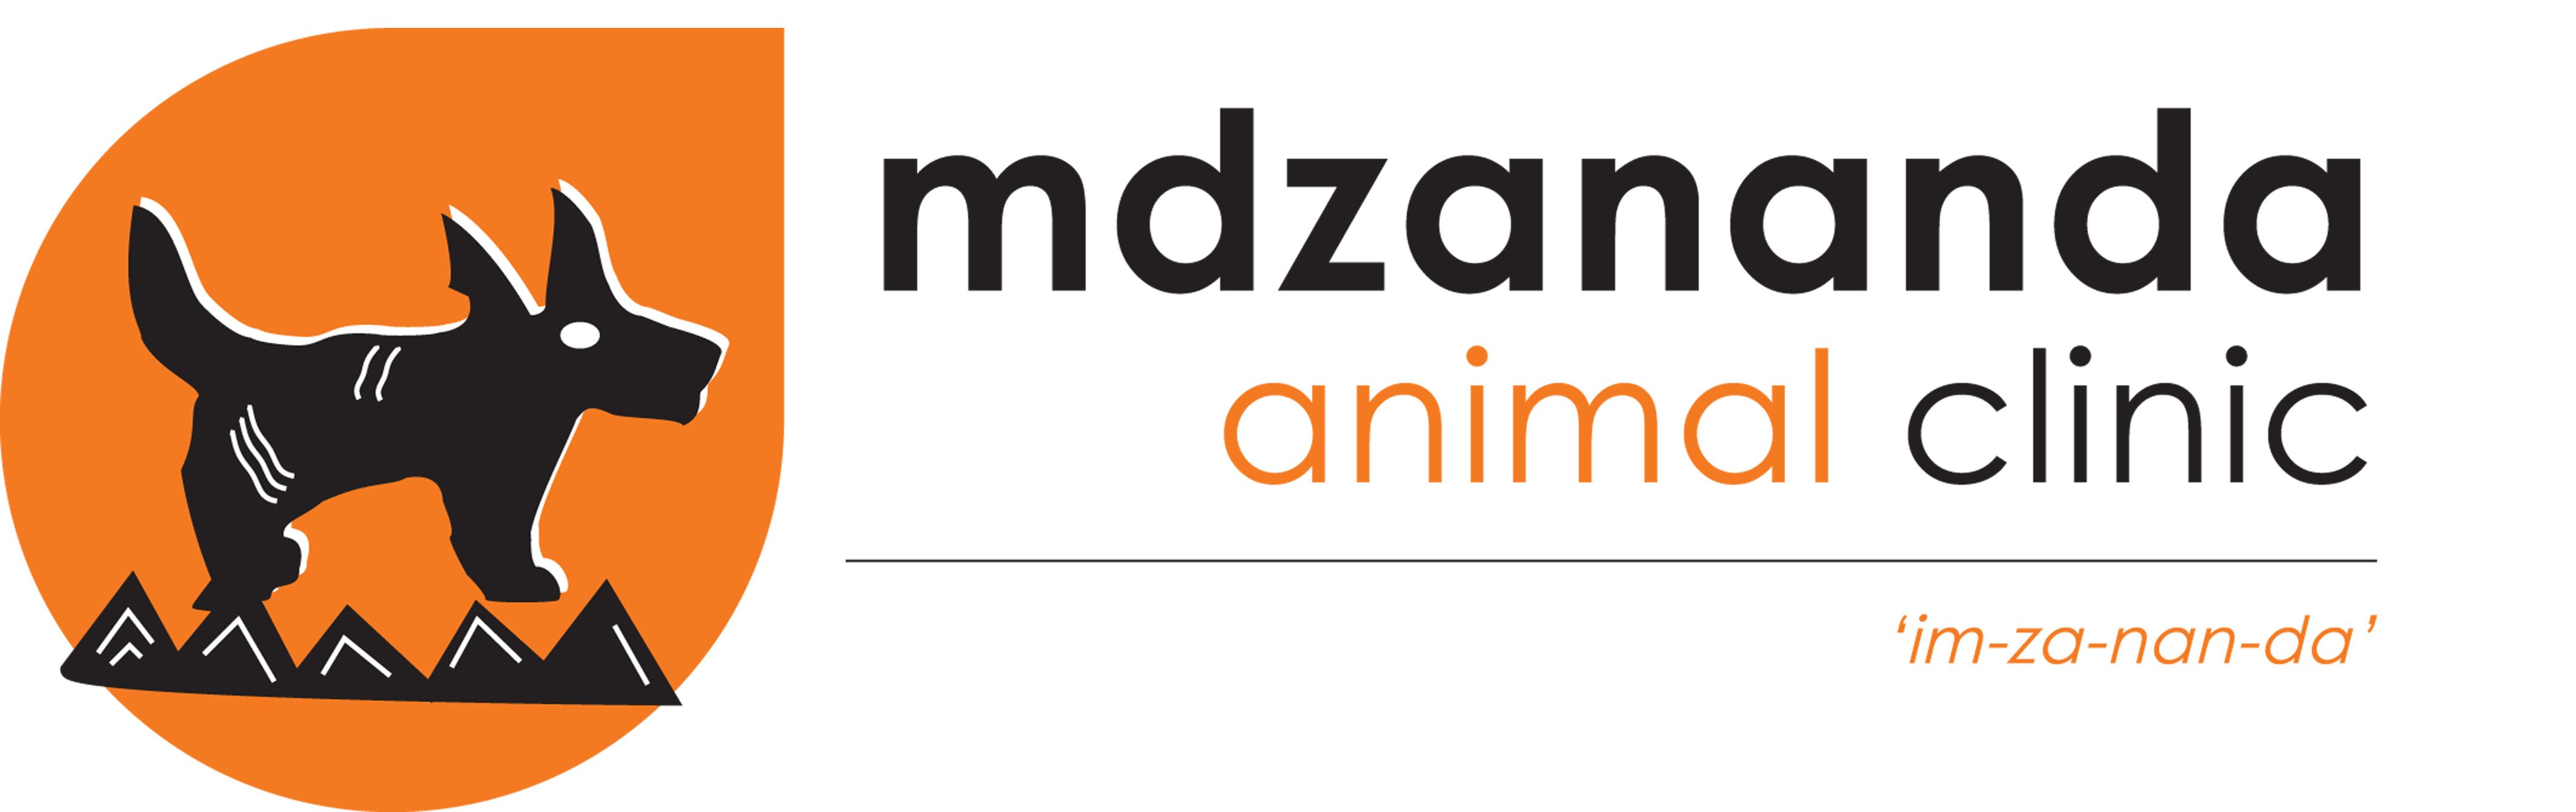 Mdzananda Animal Clinic